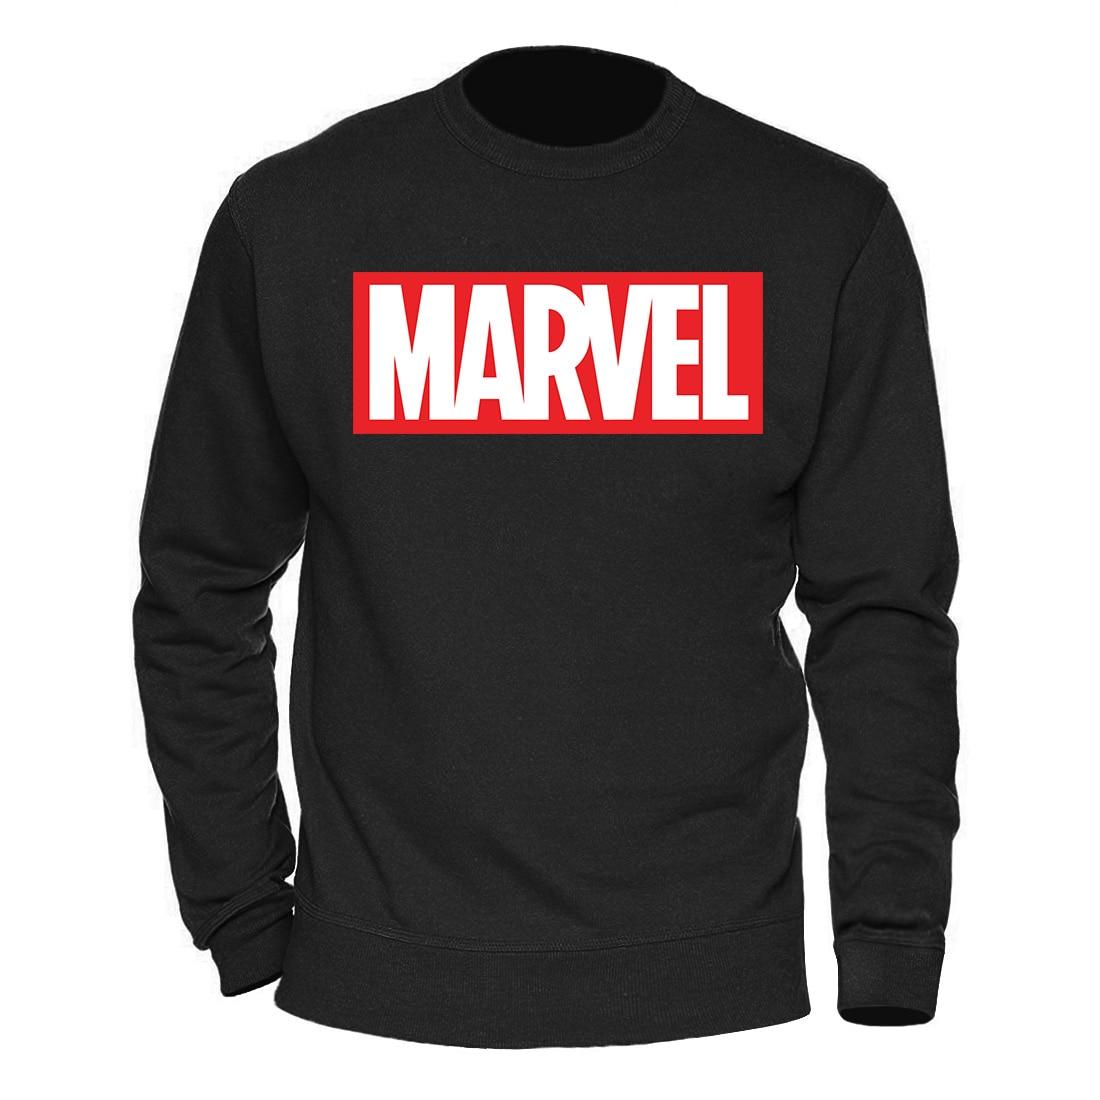 2020 quente mais novo super herói marvel sweatshirts moda supreme men marvel legal impresso camisolas streetwear roupas masculinas